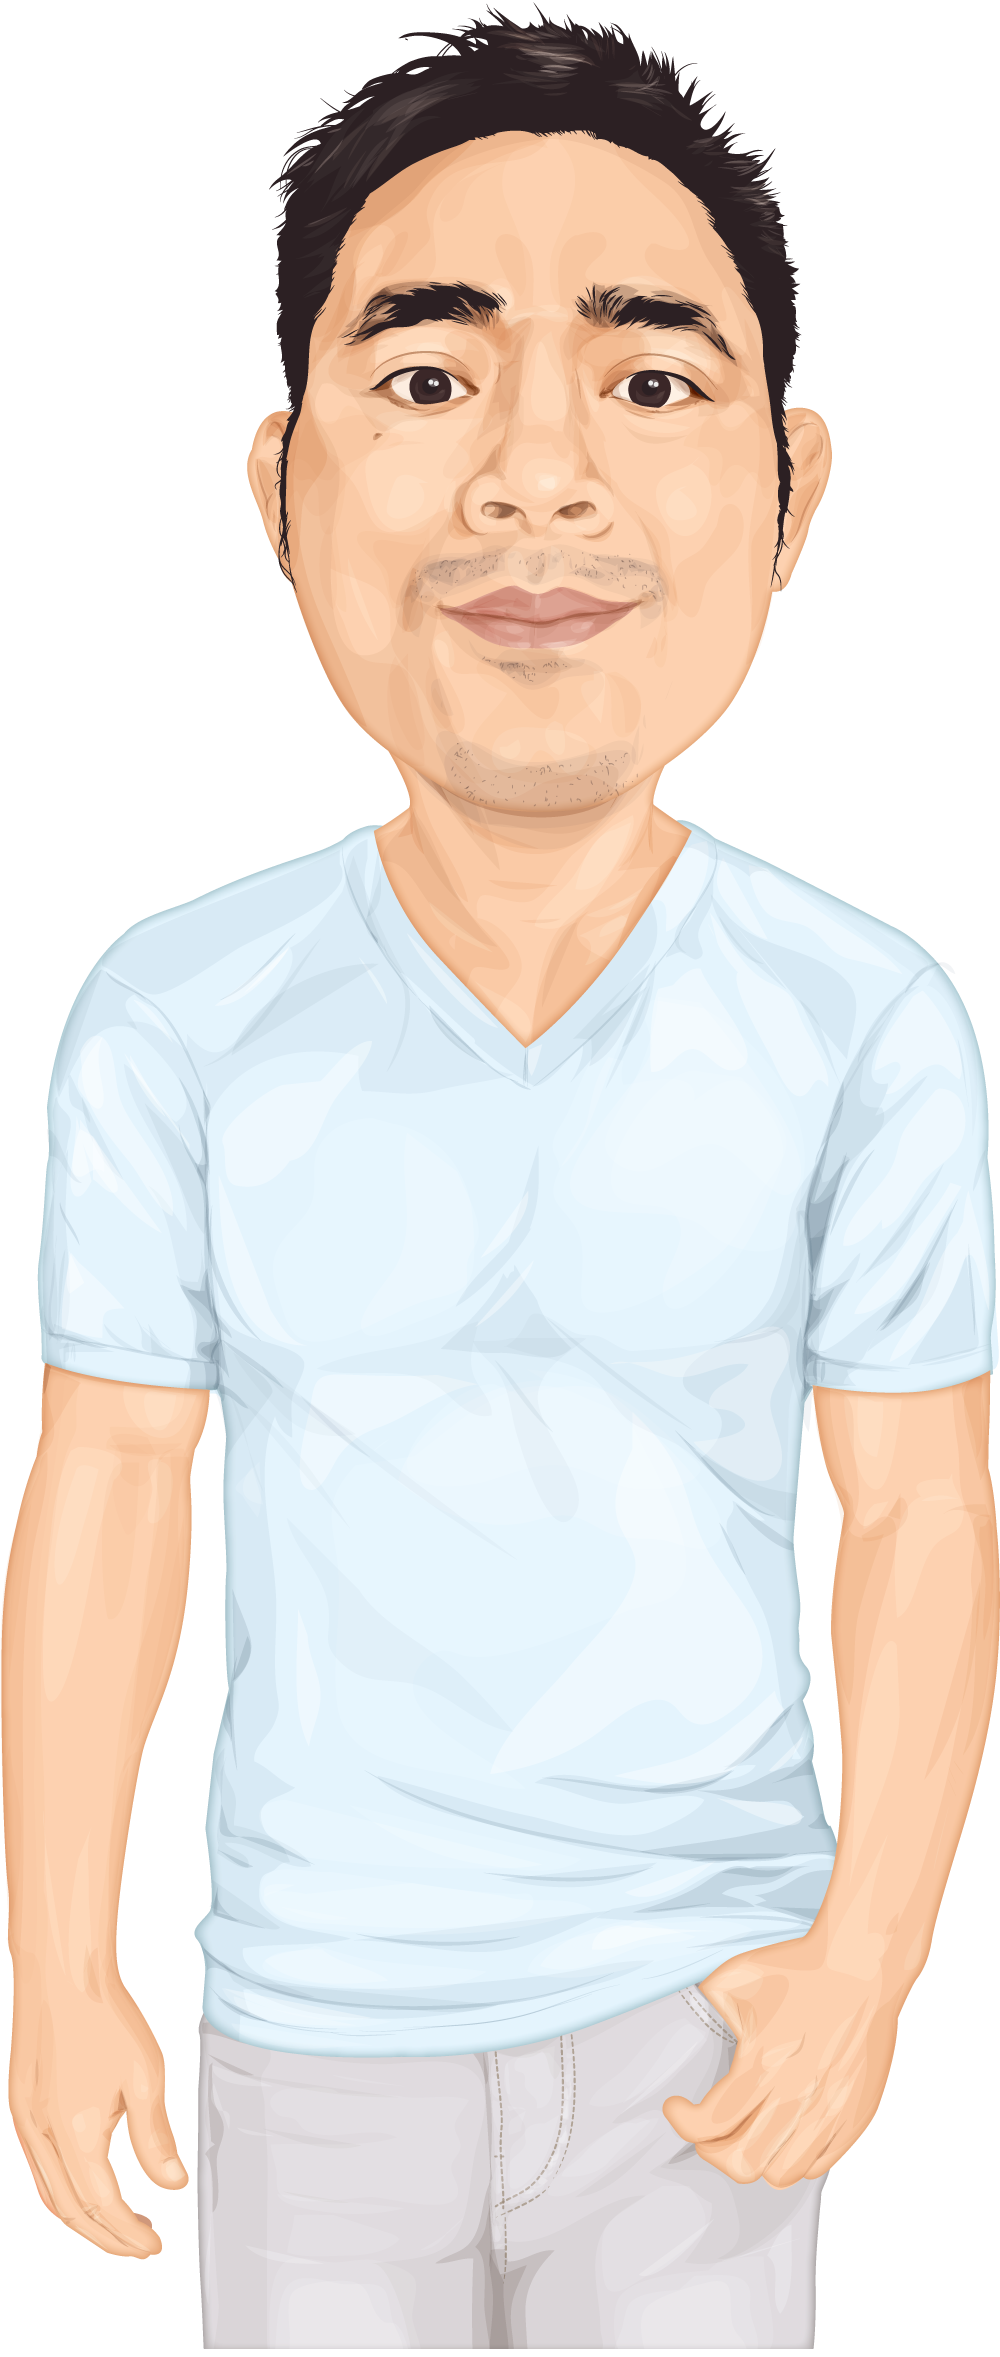 Tom Nguyen Caricature